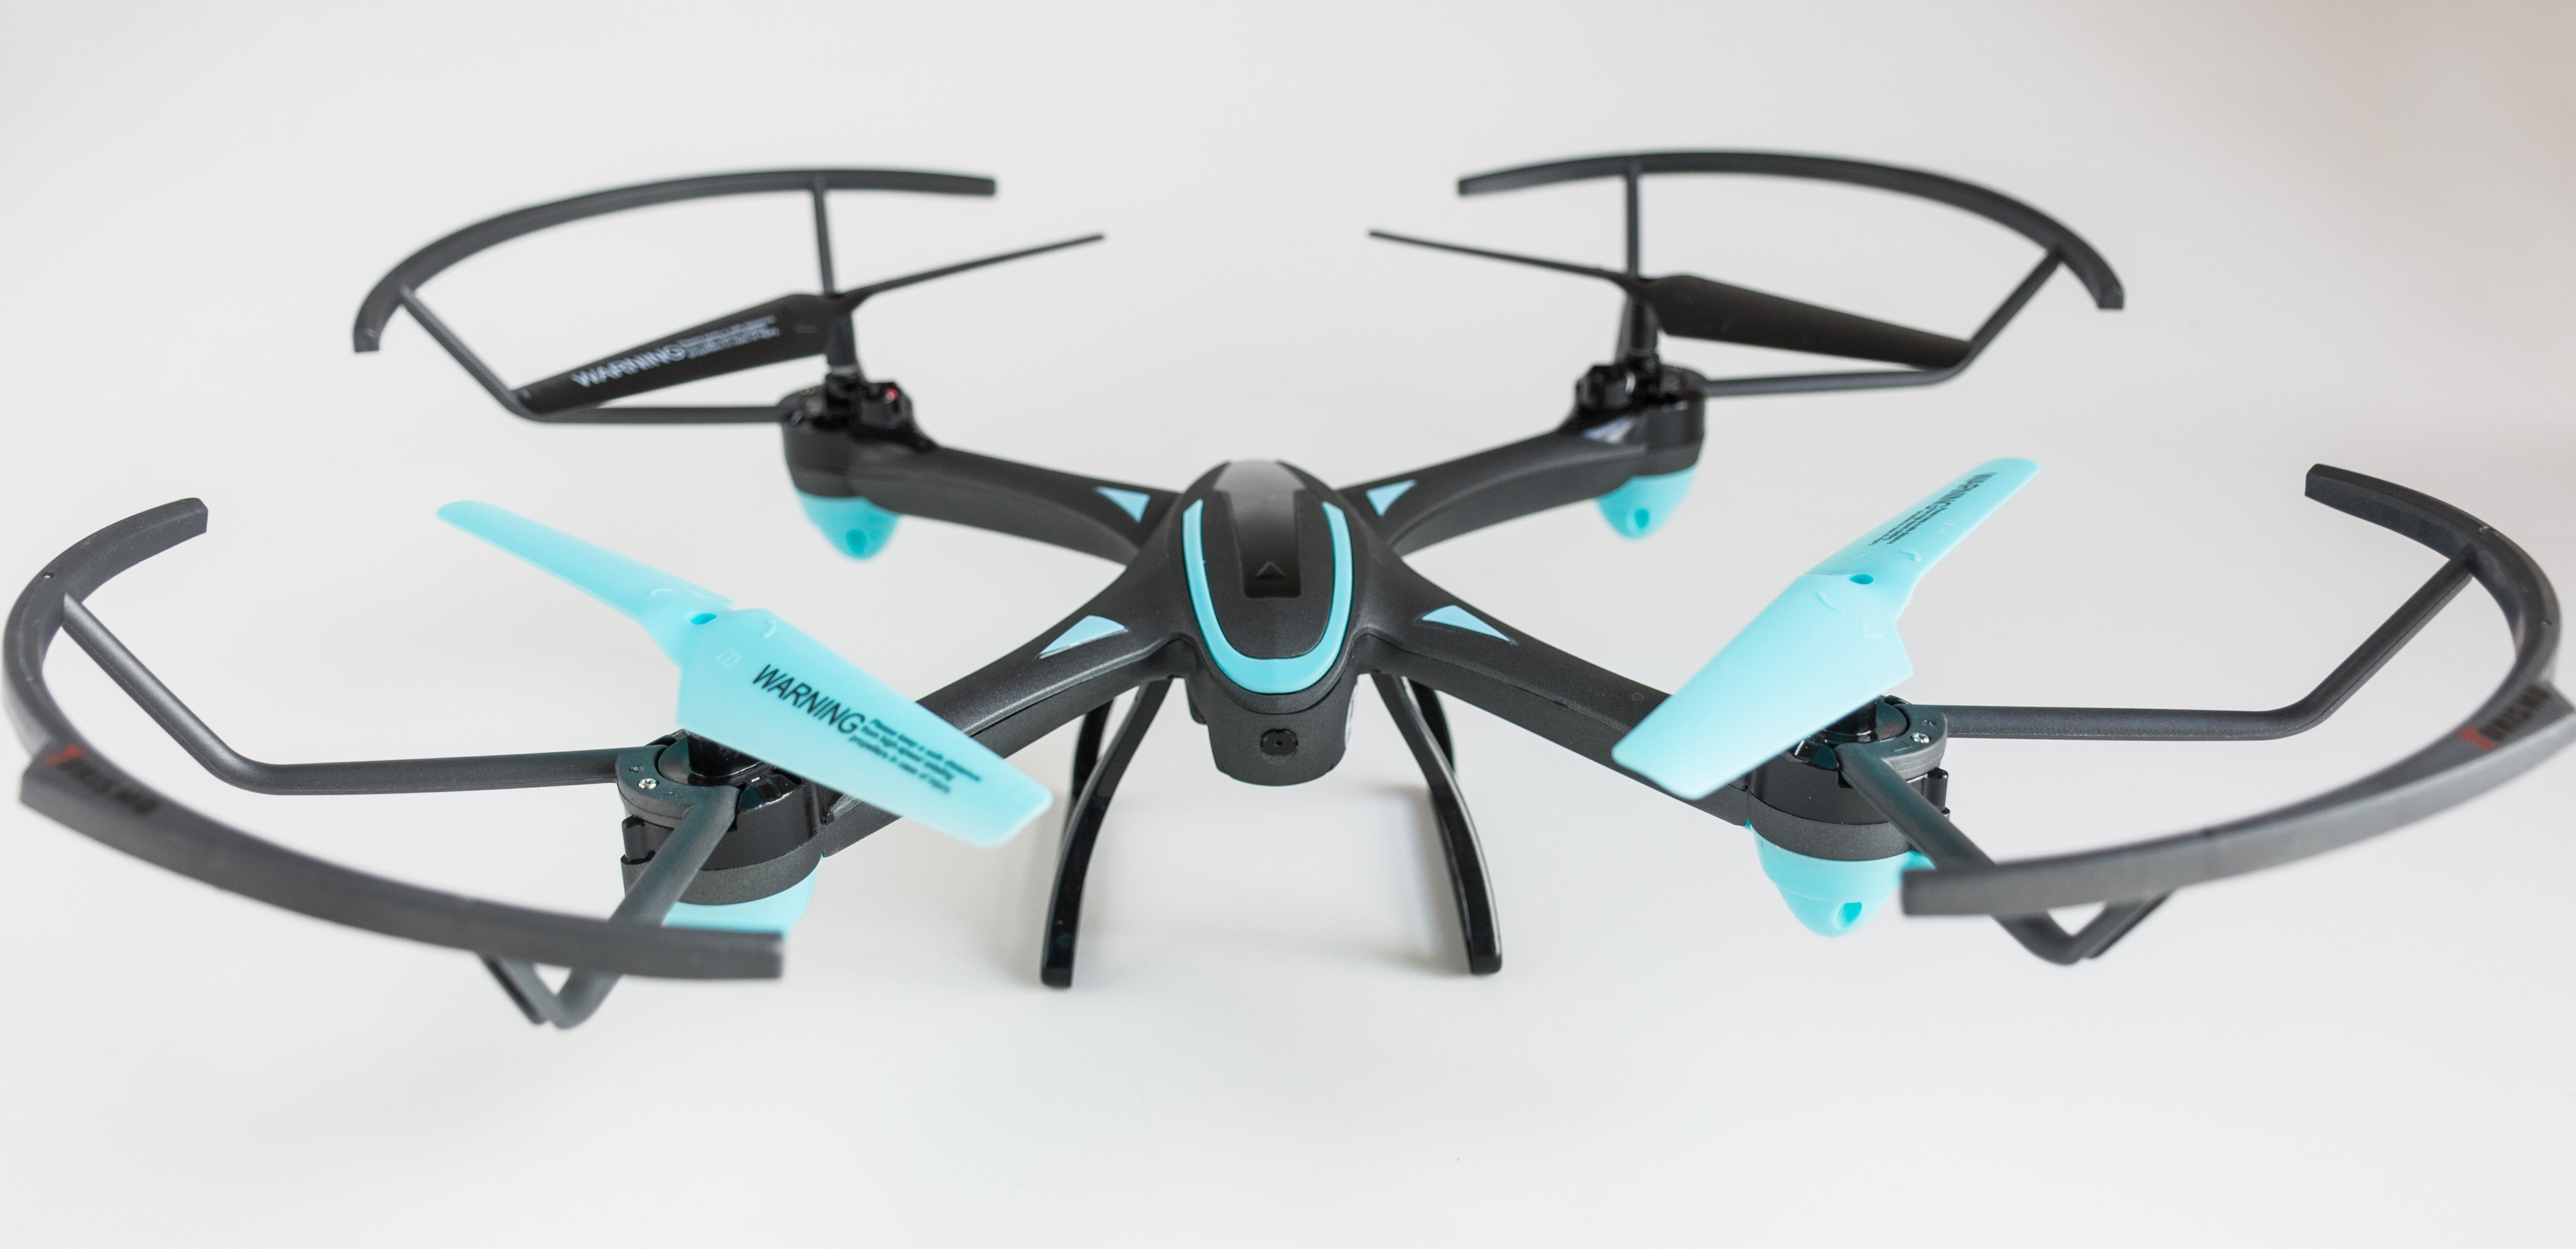 Drona FX16 Quadcopter cu camera video HD